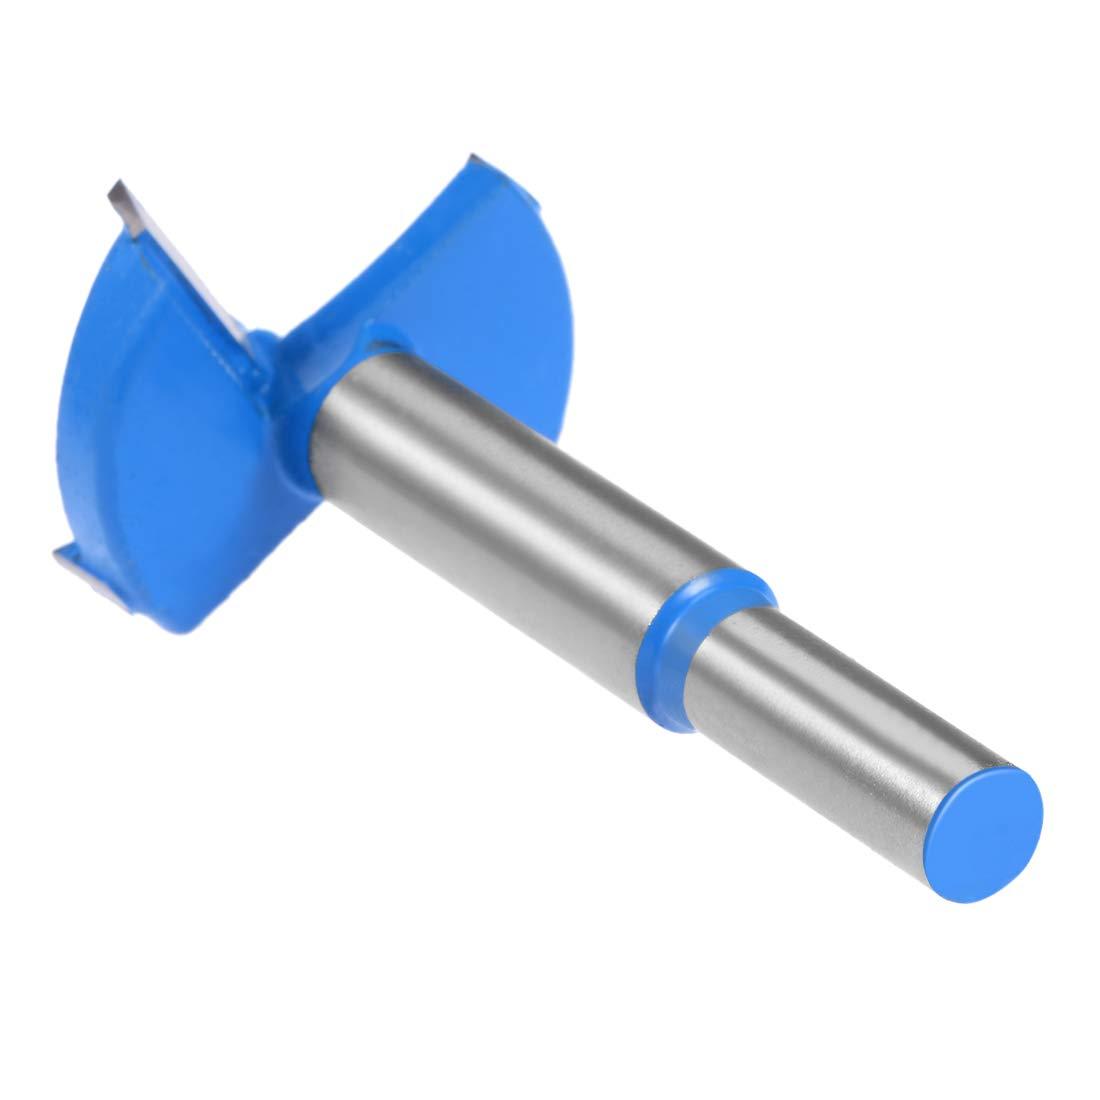 8mm Shank uxcell 25mm Carbide Hinge Boring Forstner Drill Bit